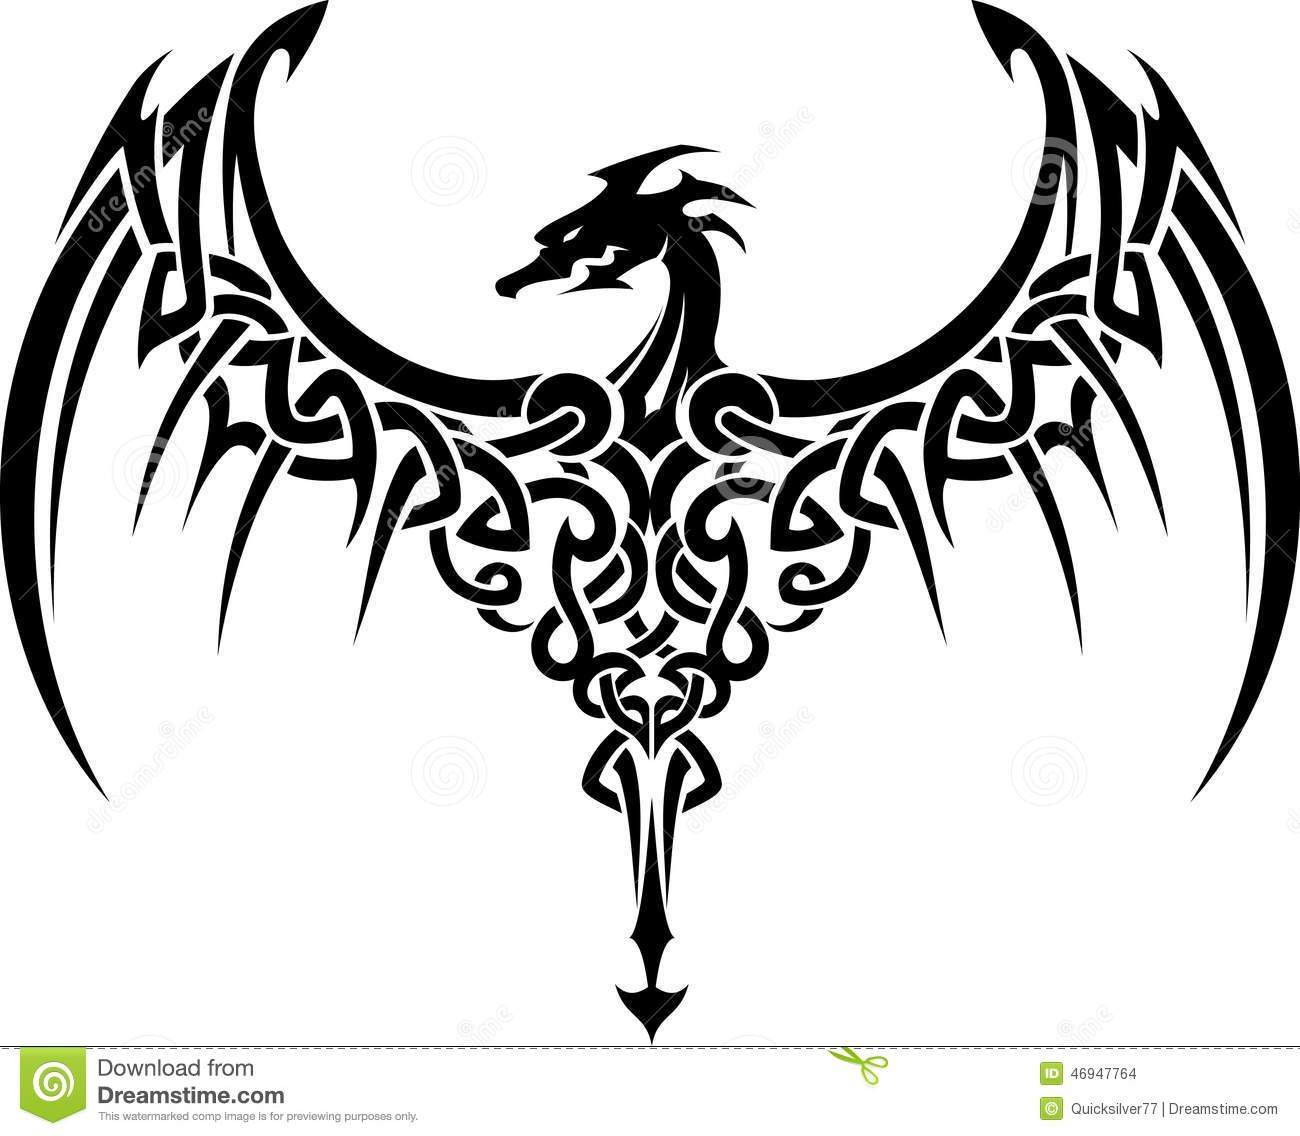 Welsh dragon tattoo designs - Celtic Dragon Tattoo Stock Illustration Image 46947764